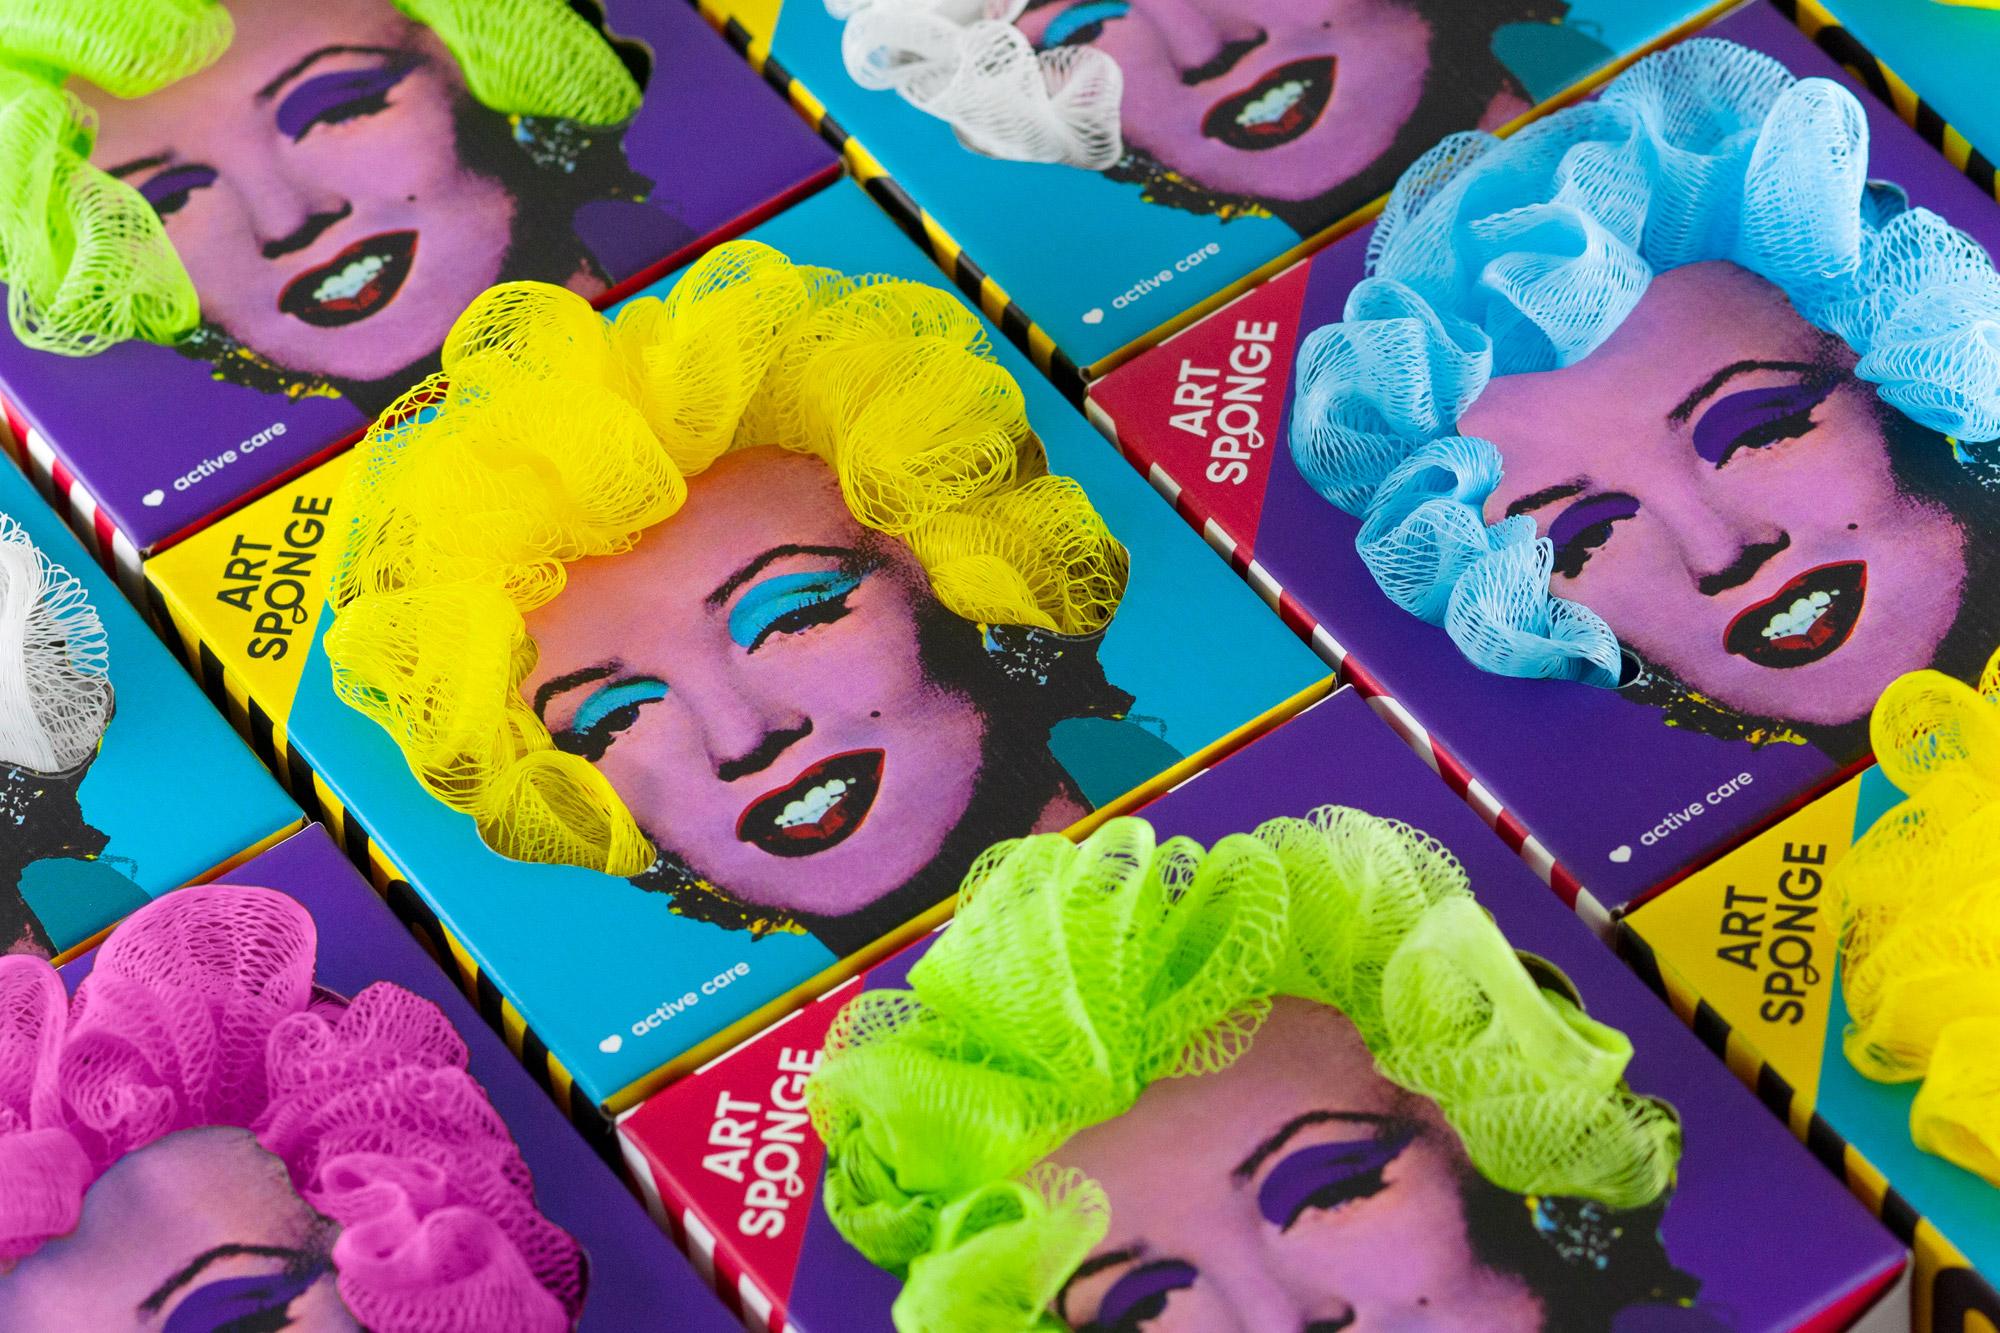 Creative Designer Gifts the Monroe Art Sponge Designed by Lesha Limonov and Mikhail Ananich